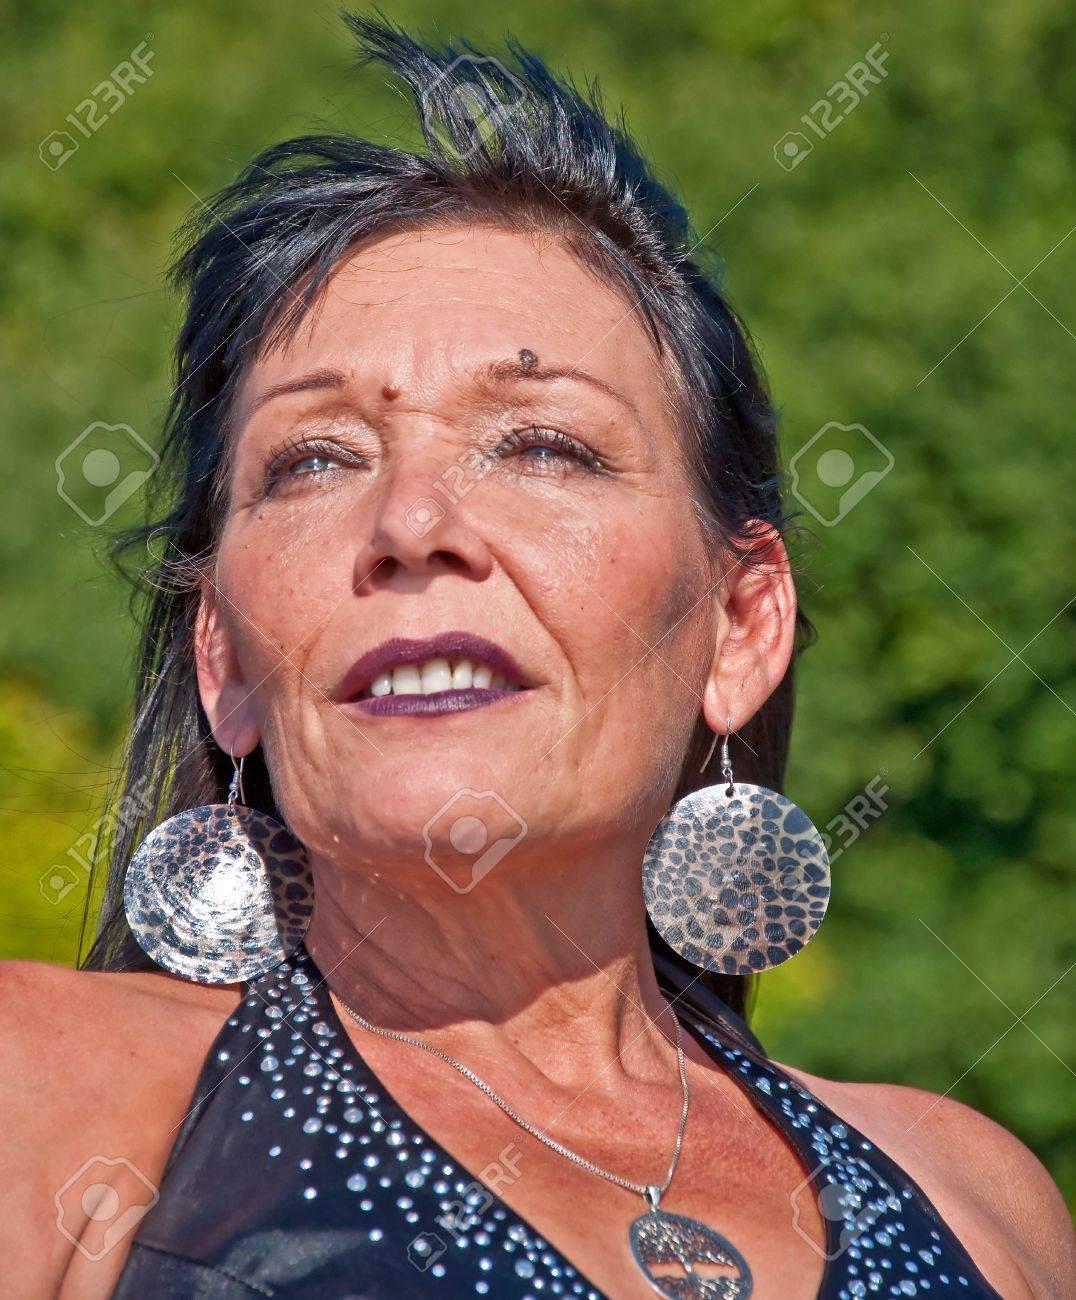 Native america mature sexy lady 10